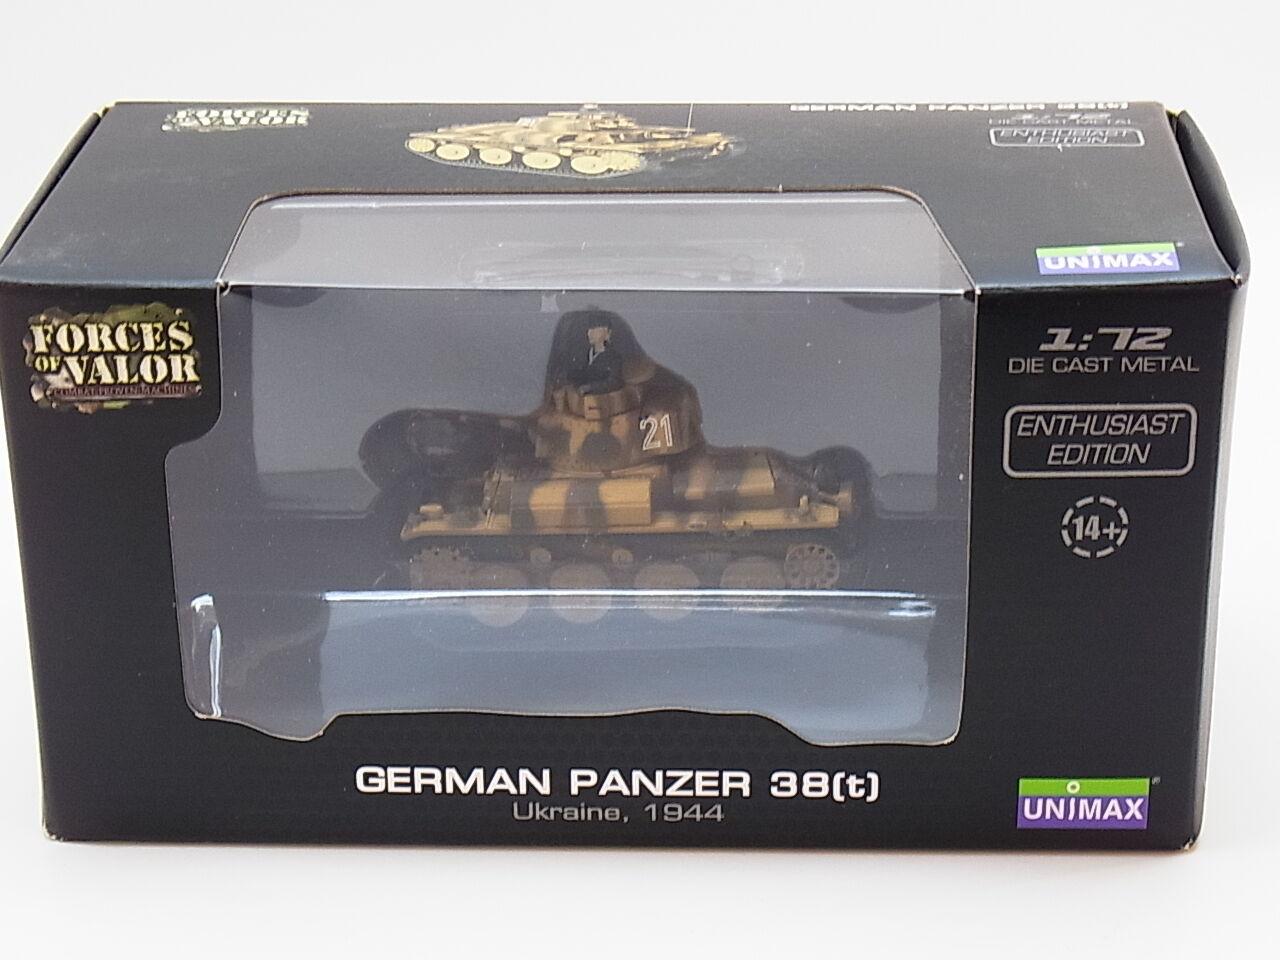 LOT 32421   Forces of Valor Ger. Panzer 38(t) Ukraine 1944 Die-Cast 1 72 NEU OVP